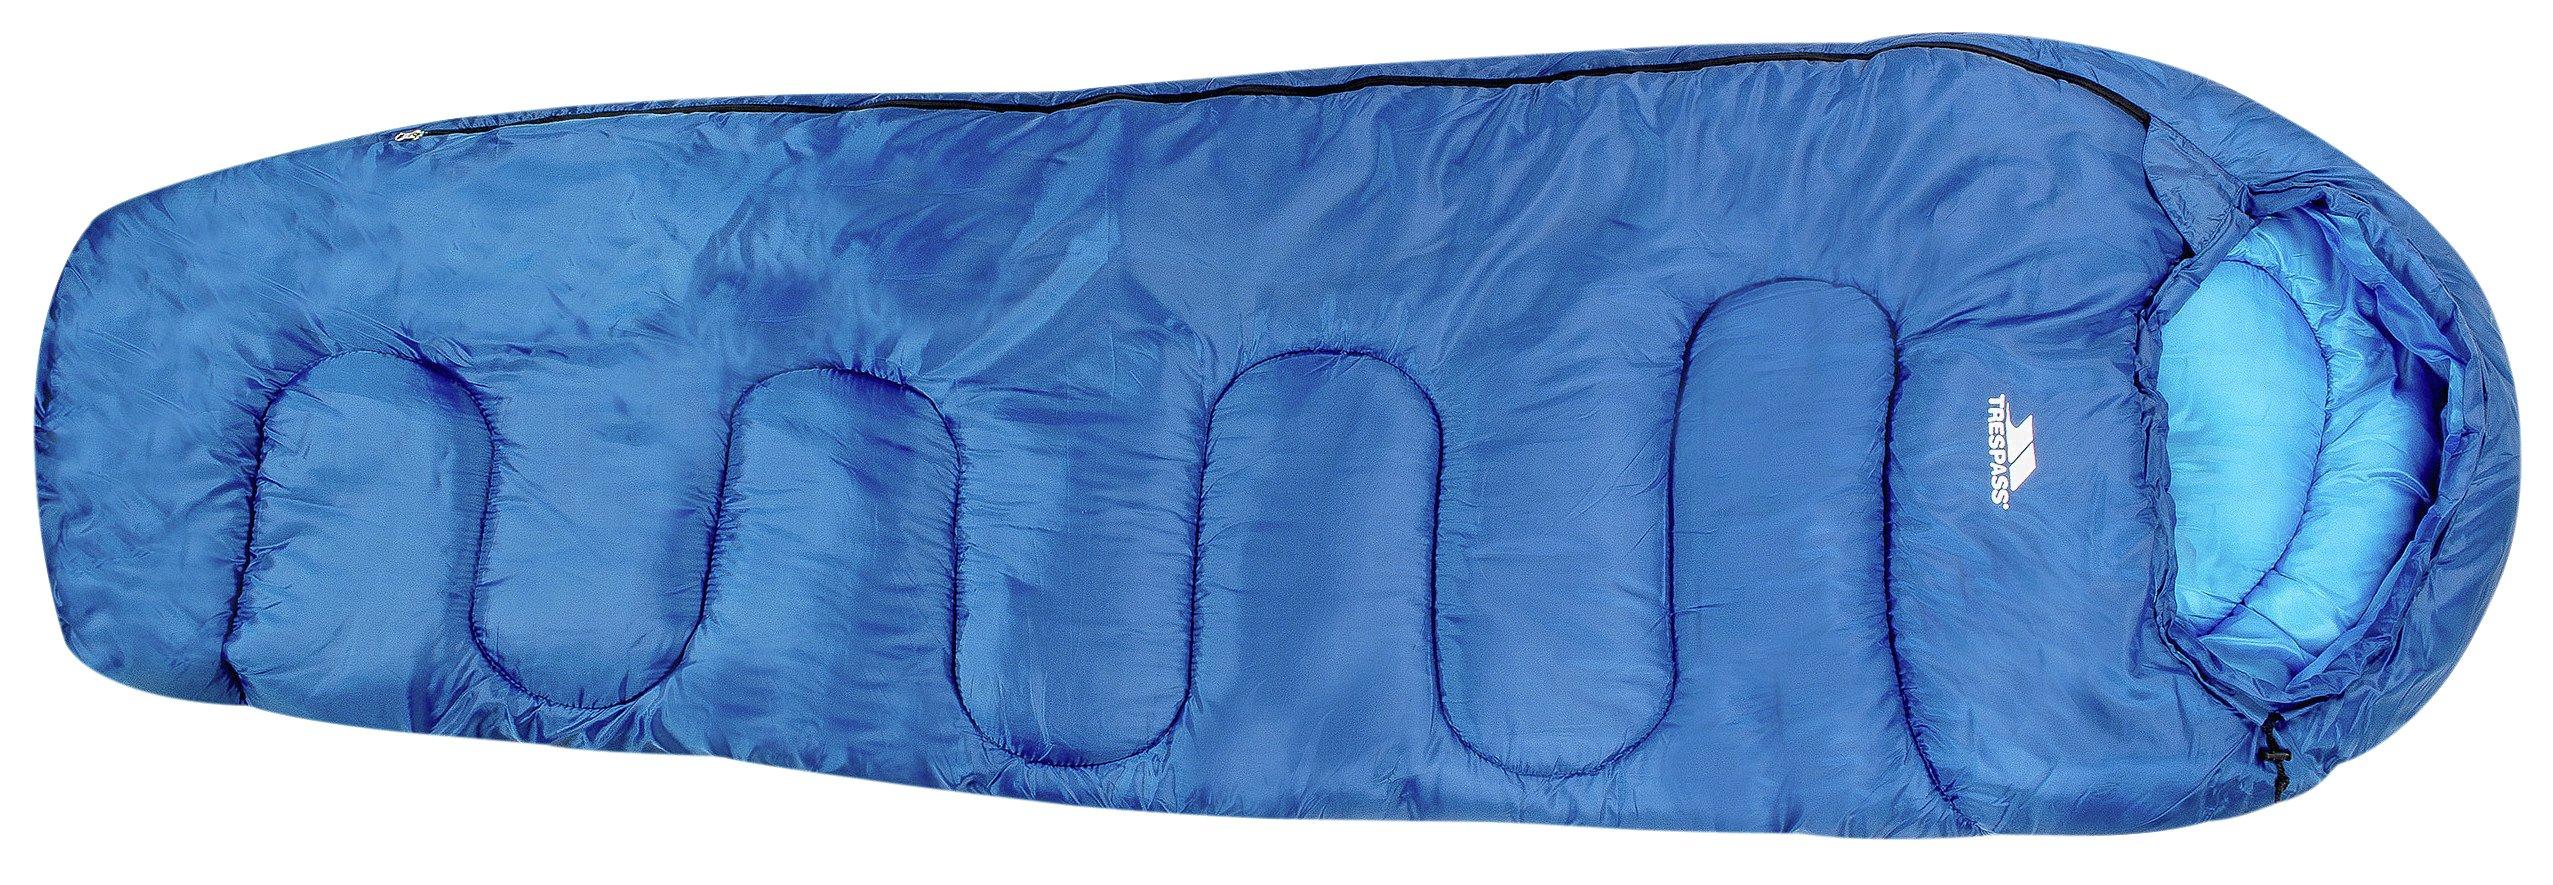 Trespass - 500GSM - Single Mummy Sleeping Bag lowest price